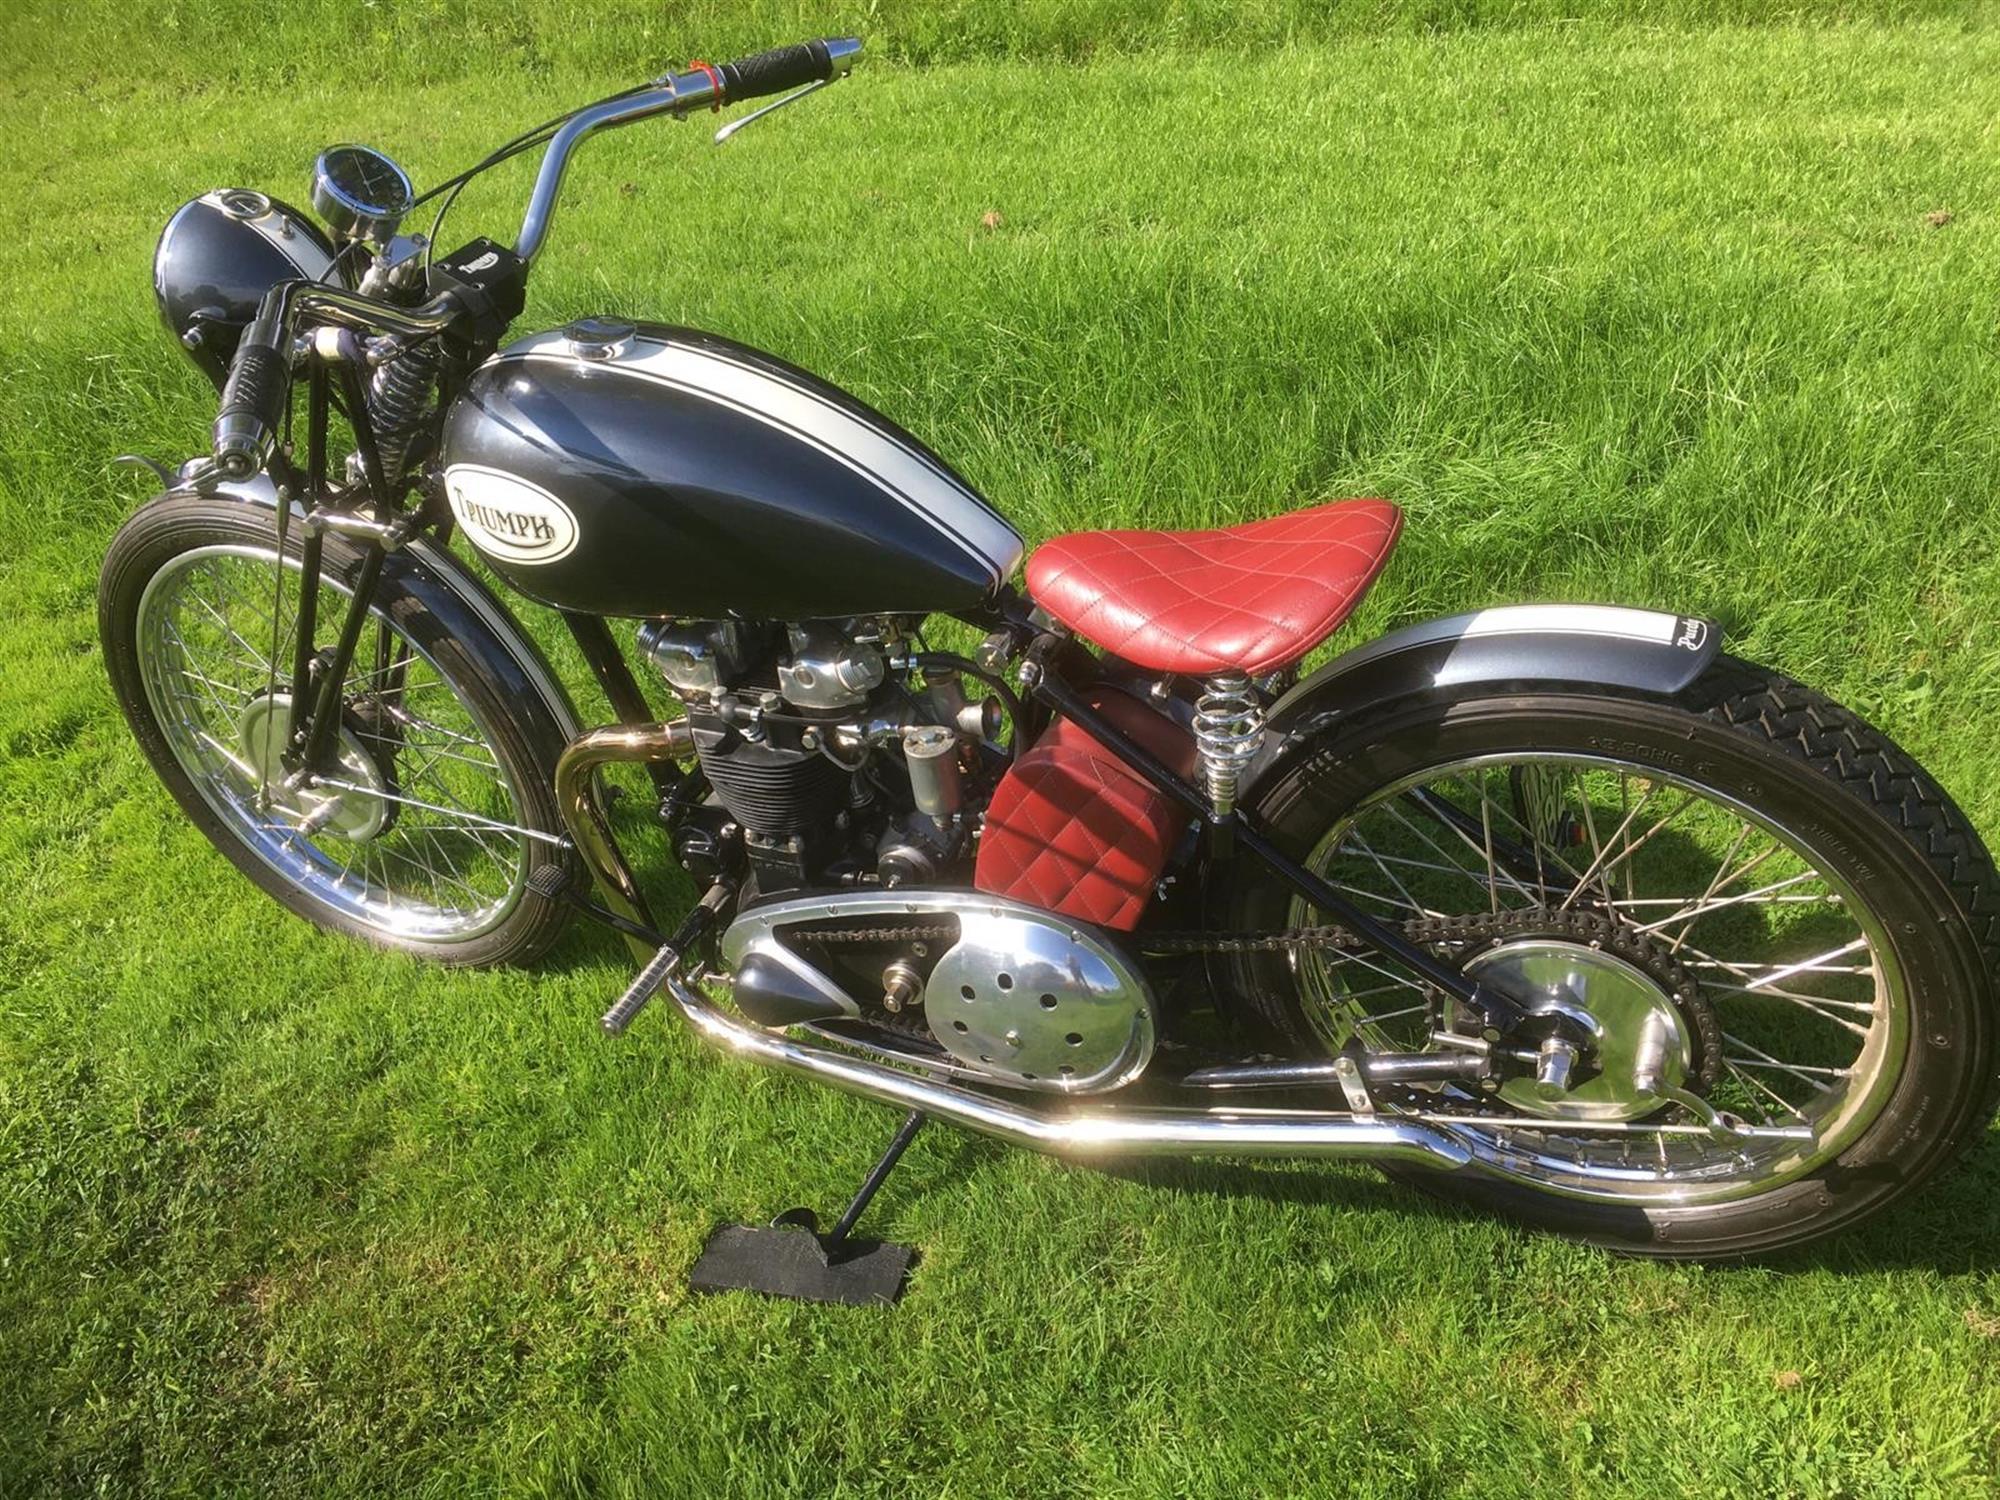 1952 Purdy Triumph 500 - Image 2 of 10